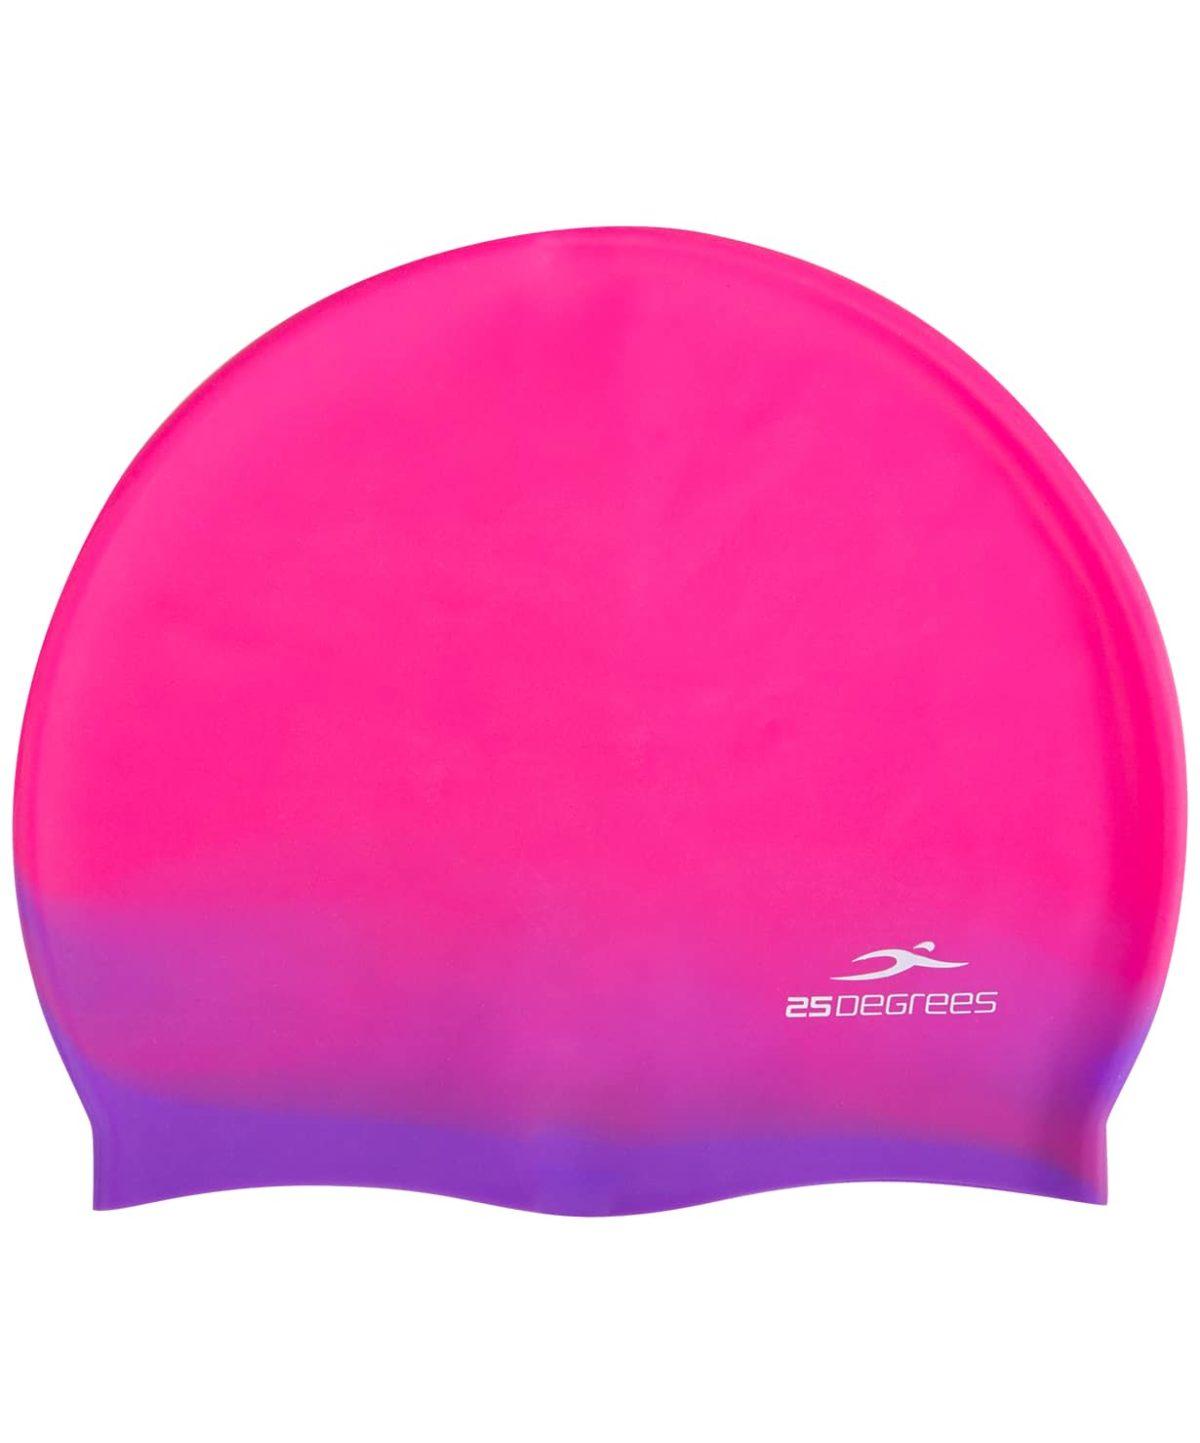 25DEGREES Шапочка для плавания Relast, силикон  25D21011A: розовый/фиолетовый - 2